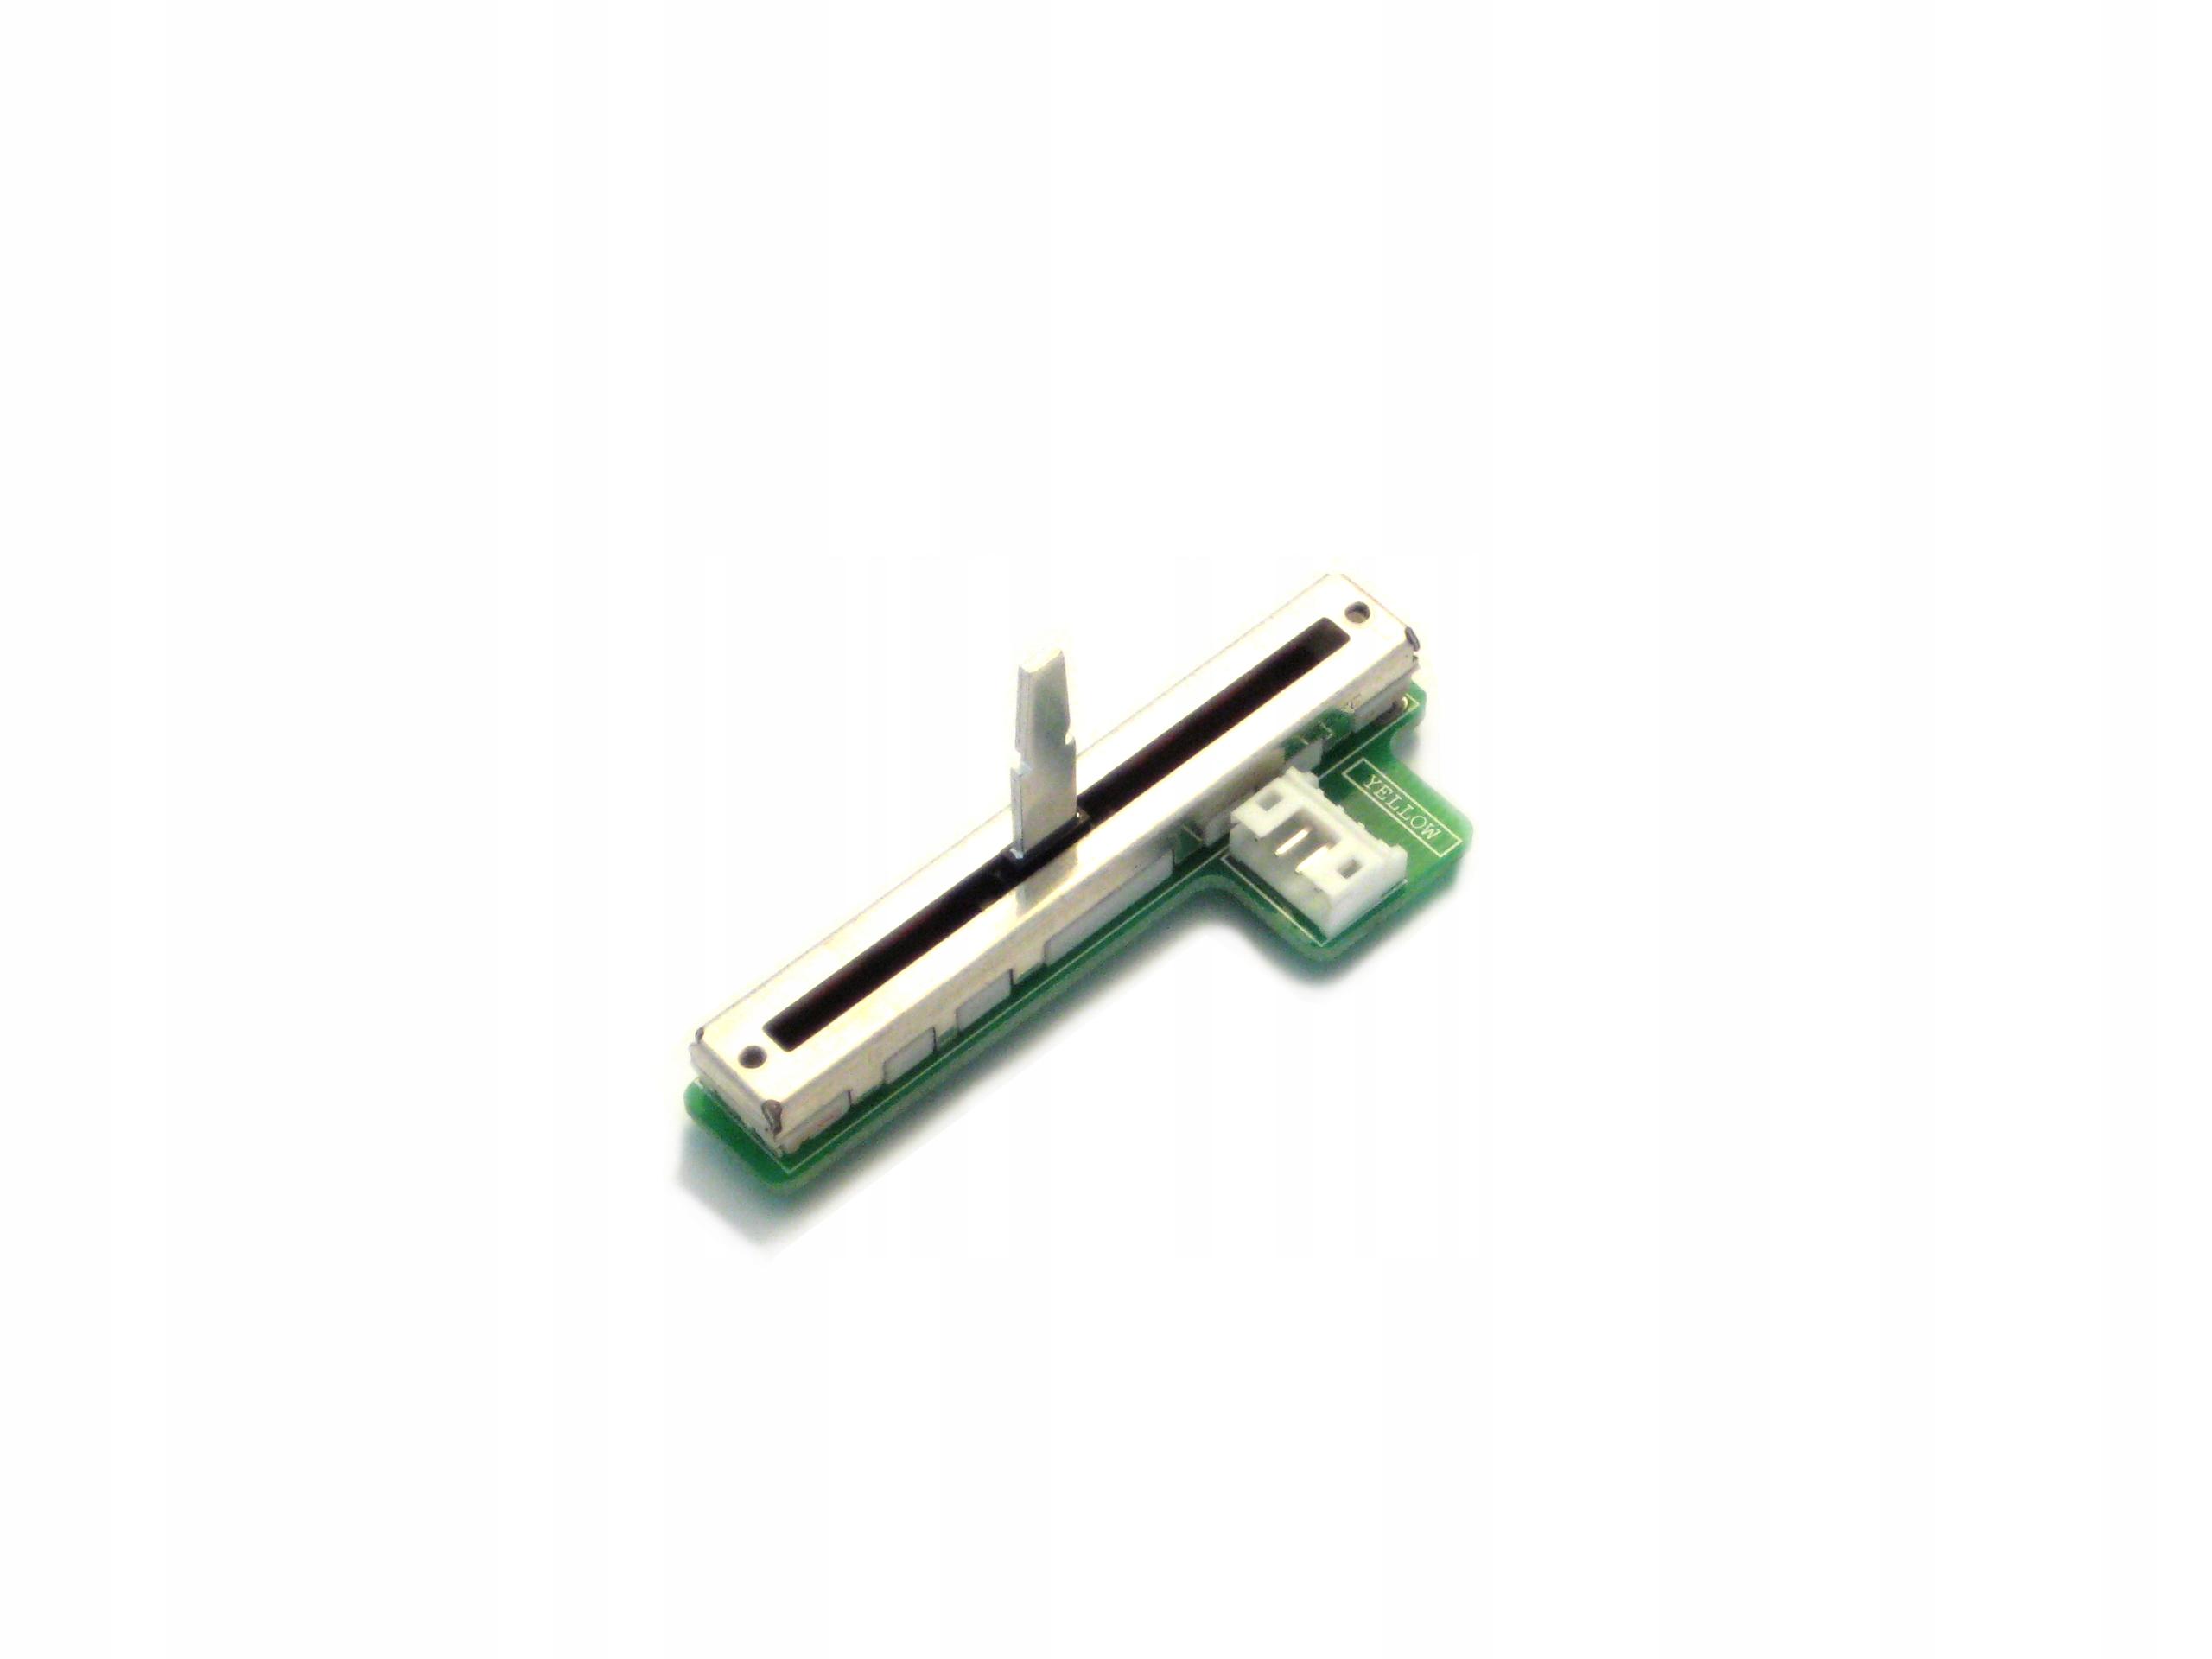 [FADERA] FADER s PCB PCB DJM 700 DCV1010